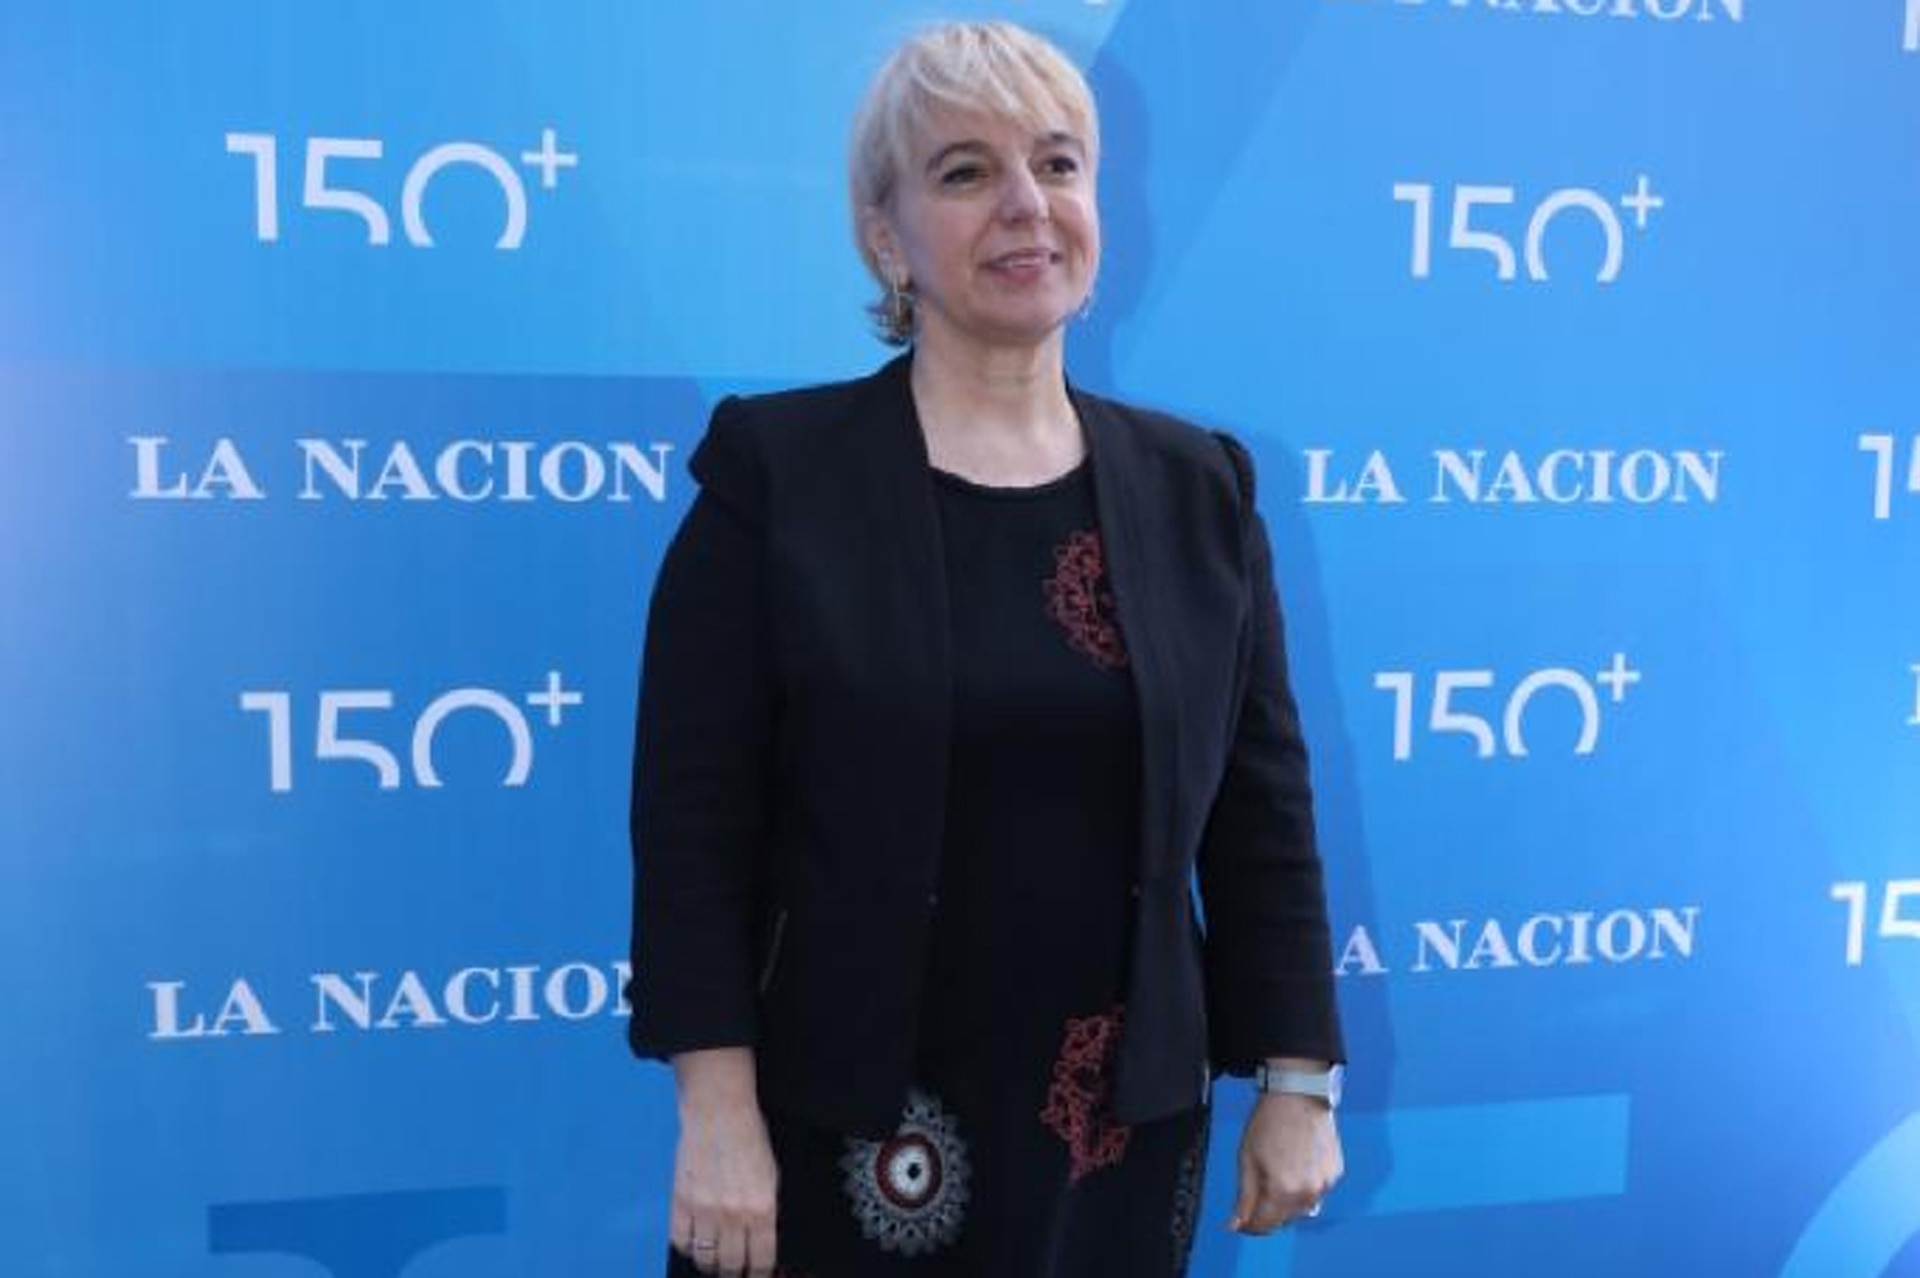 Silvana Giudici, presidenta del Ente Nacional de Comunicaciones (Enacom)